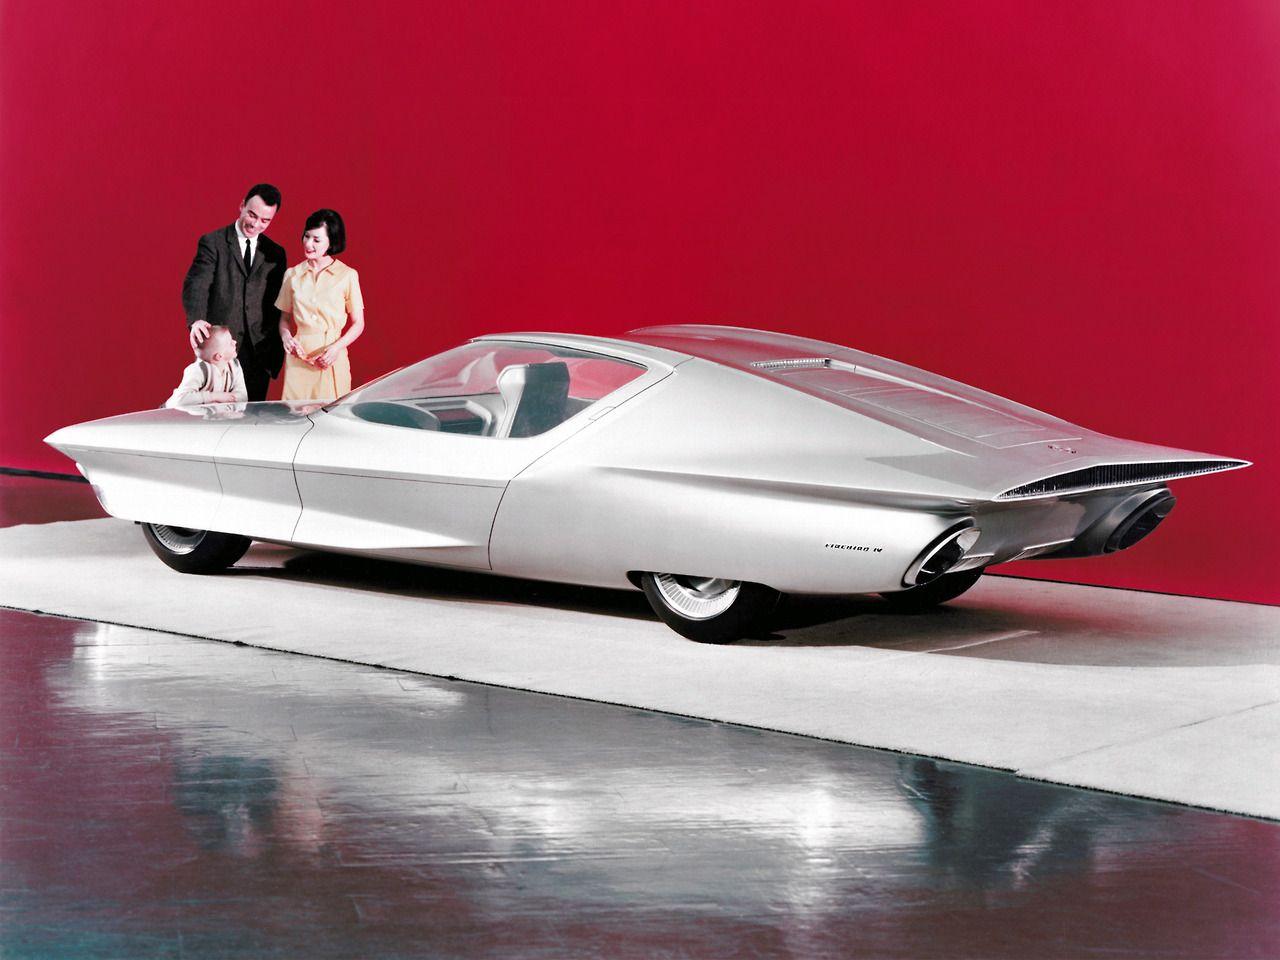 1964 GM Firebird IV Concept. Awesome!